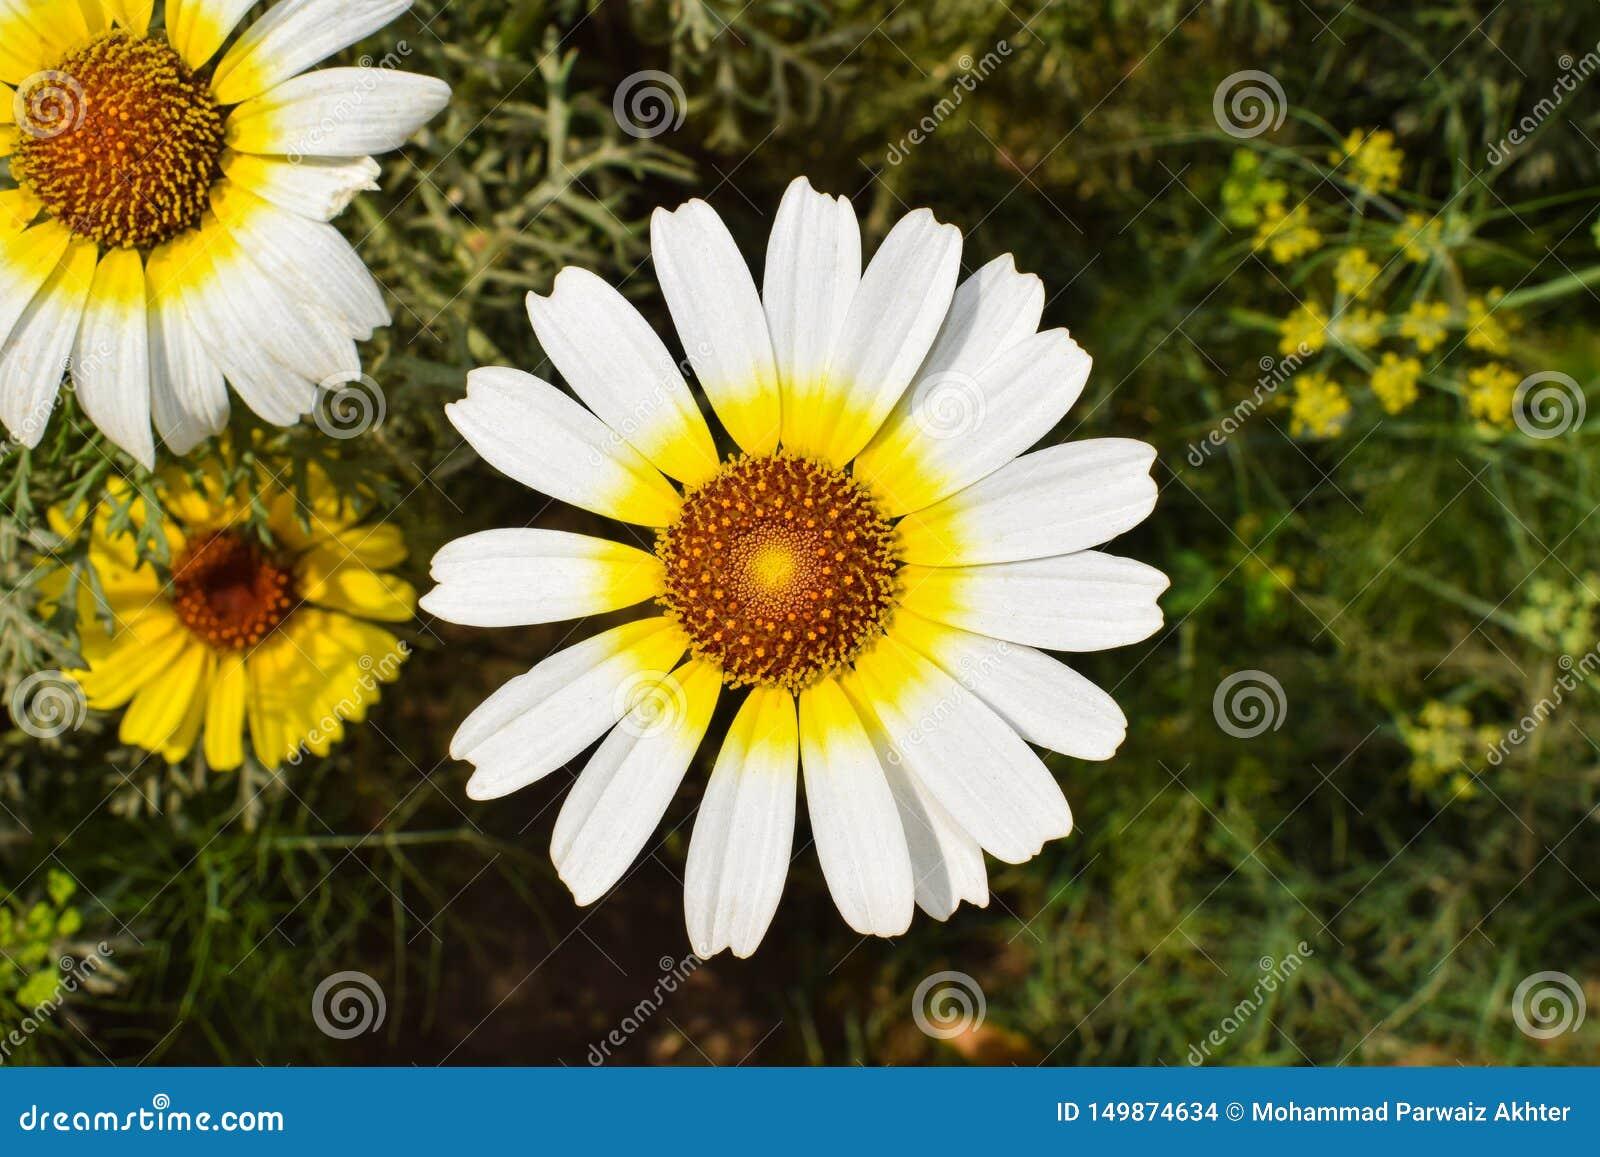 En vit och gul tusensköna agarden in